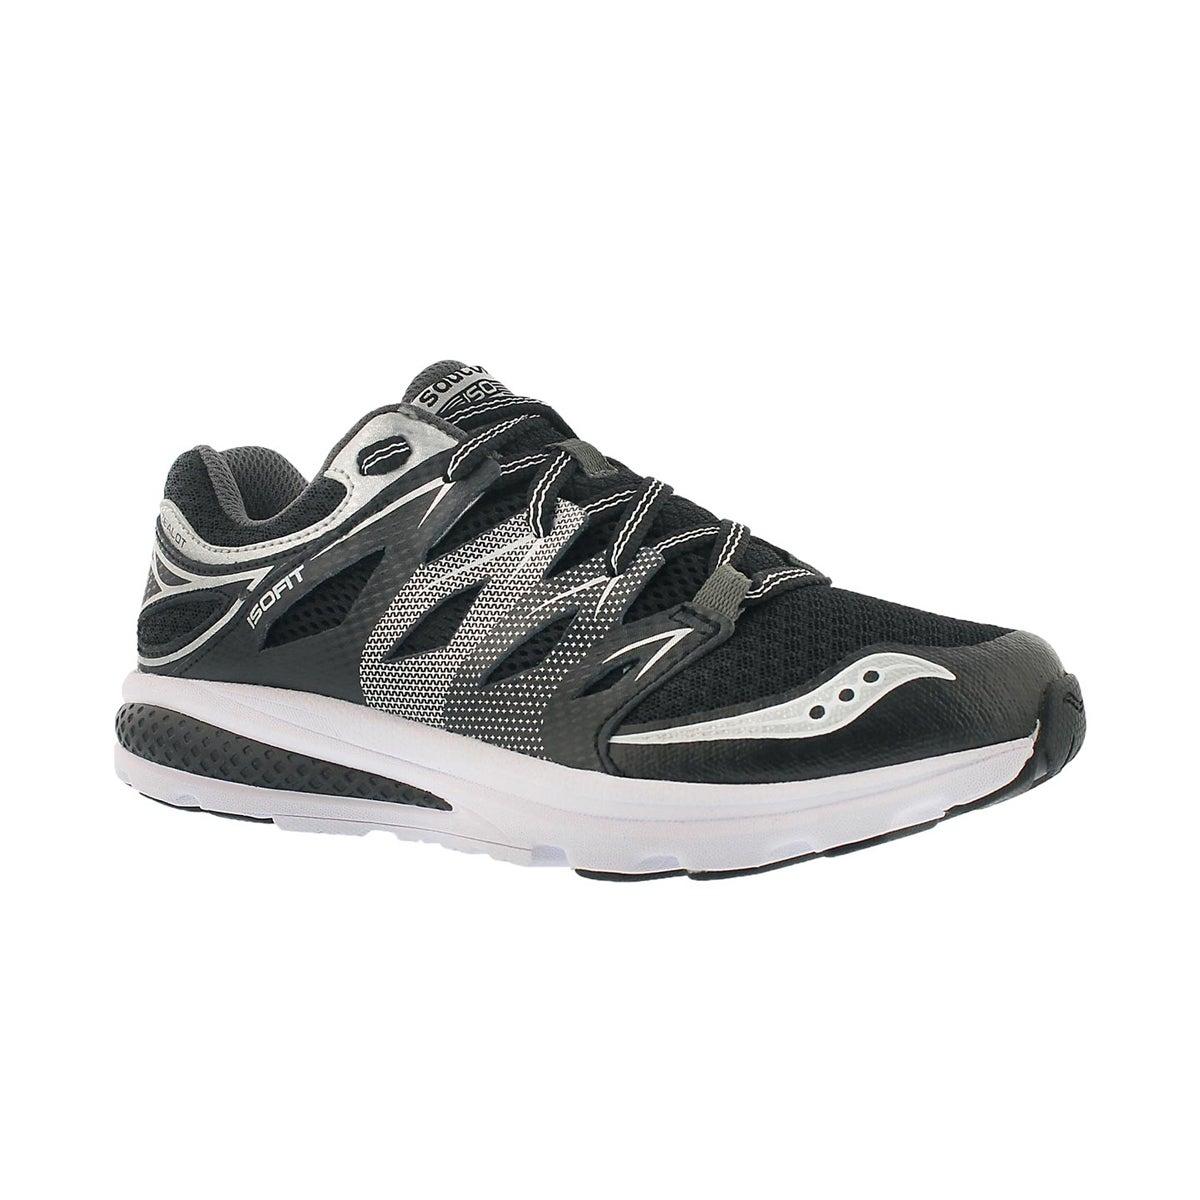 Boys' ZEALOT 2 black lace up running shoes